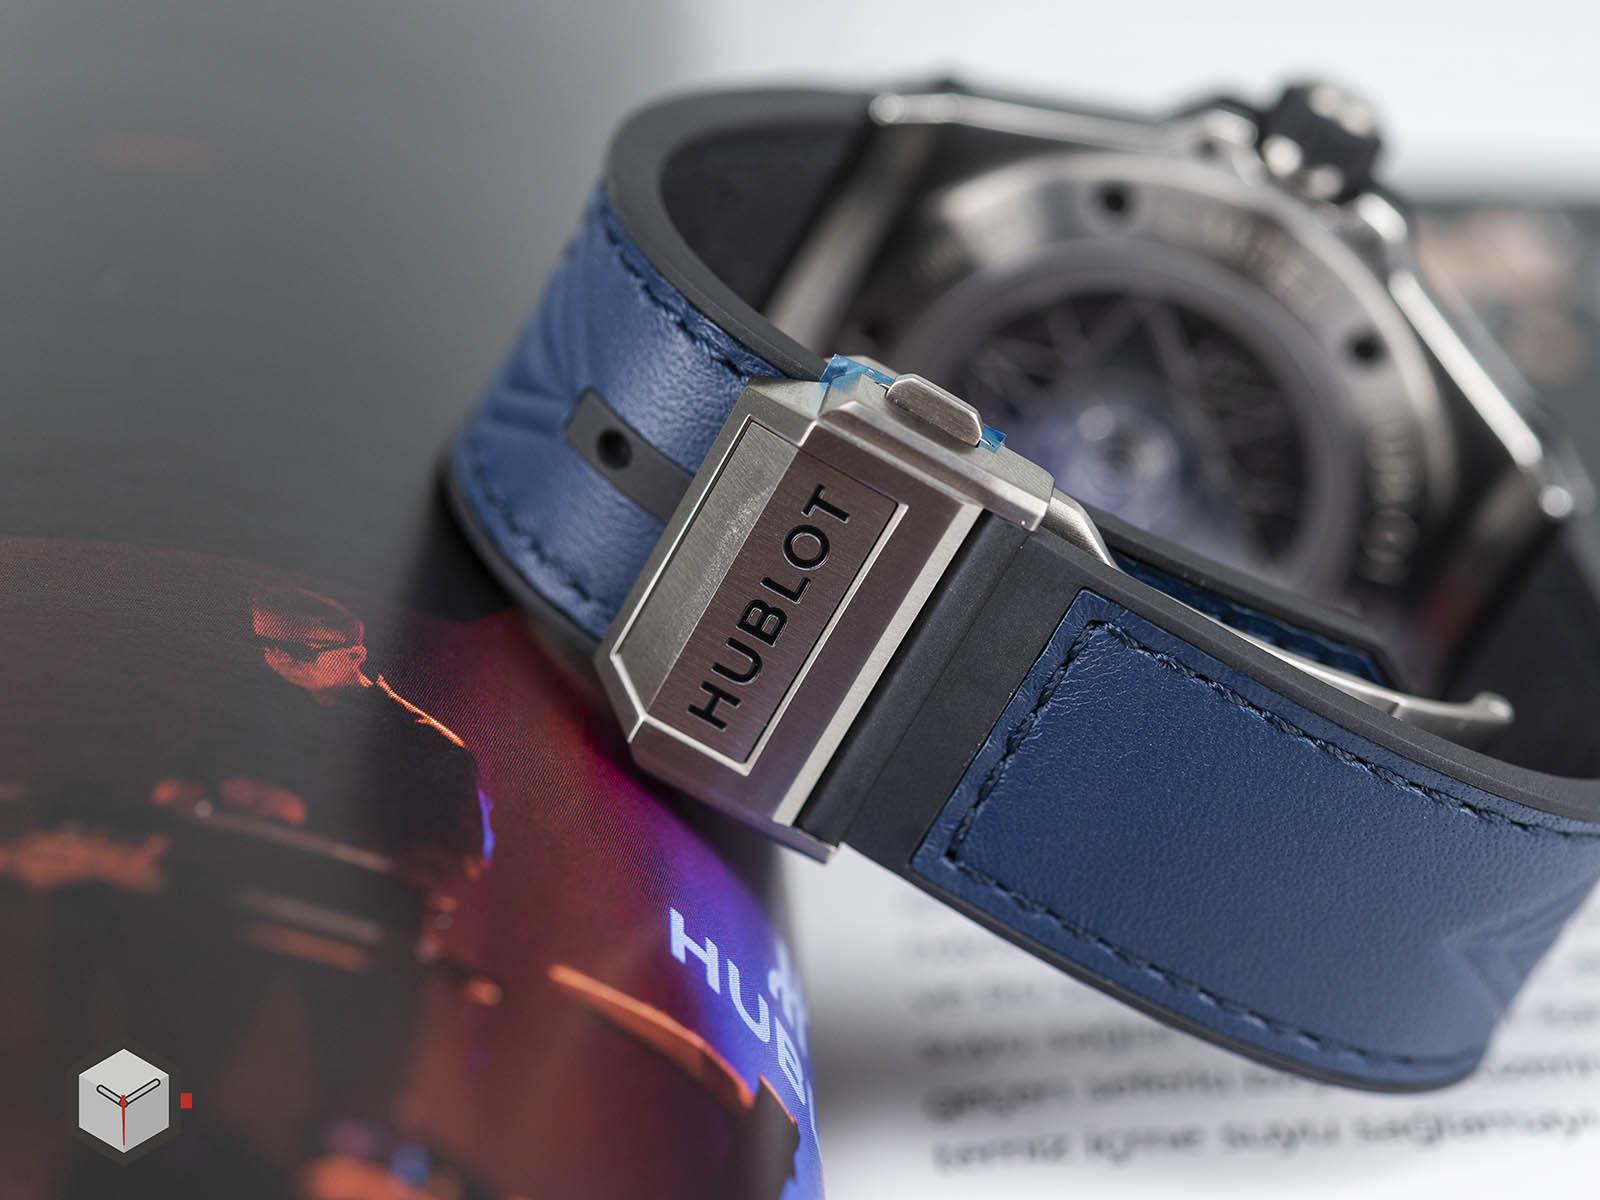 415-nx-7179-vr-mxm18-hublot-big-bang-sang-bleu-titanium-blue-8.jpg